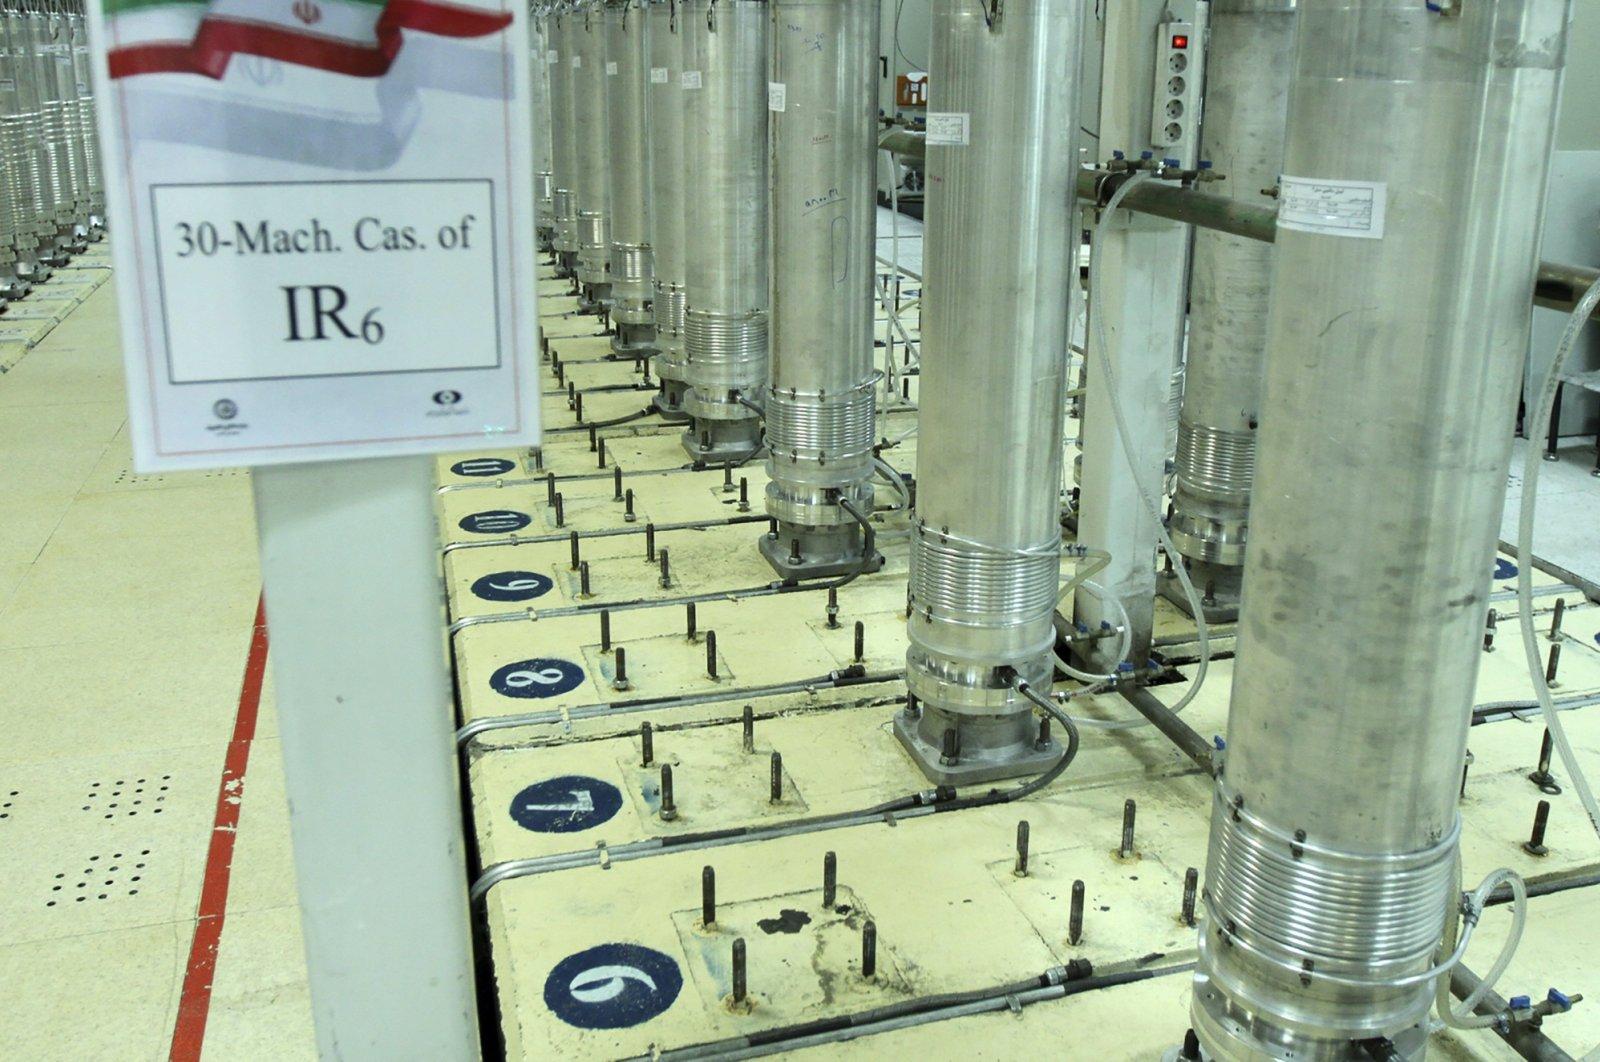 Centrifuge machines in the Natanz uranium enrichment facility in Natanz, central Iran, Nov. 5, 2019. (Atomic Energy Organization of Iran/AP Photo)